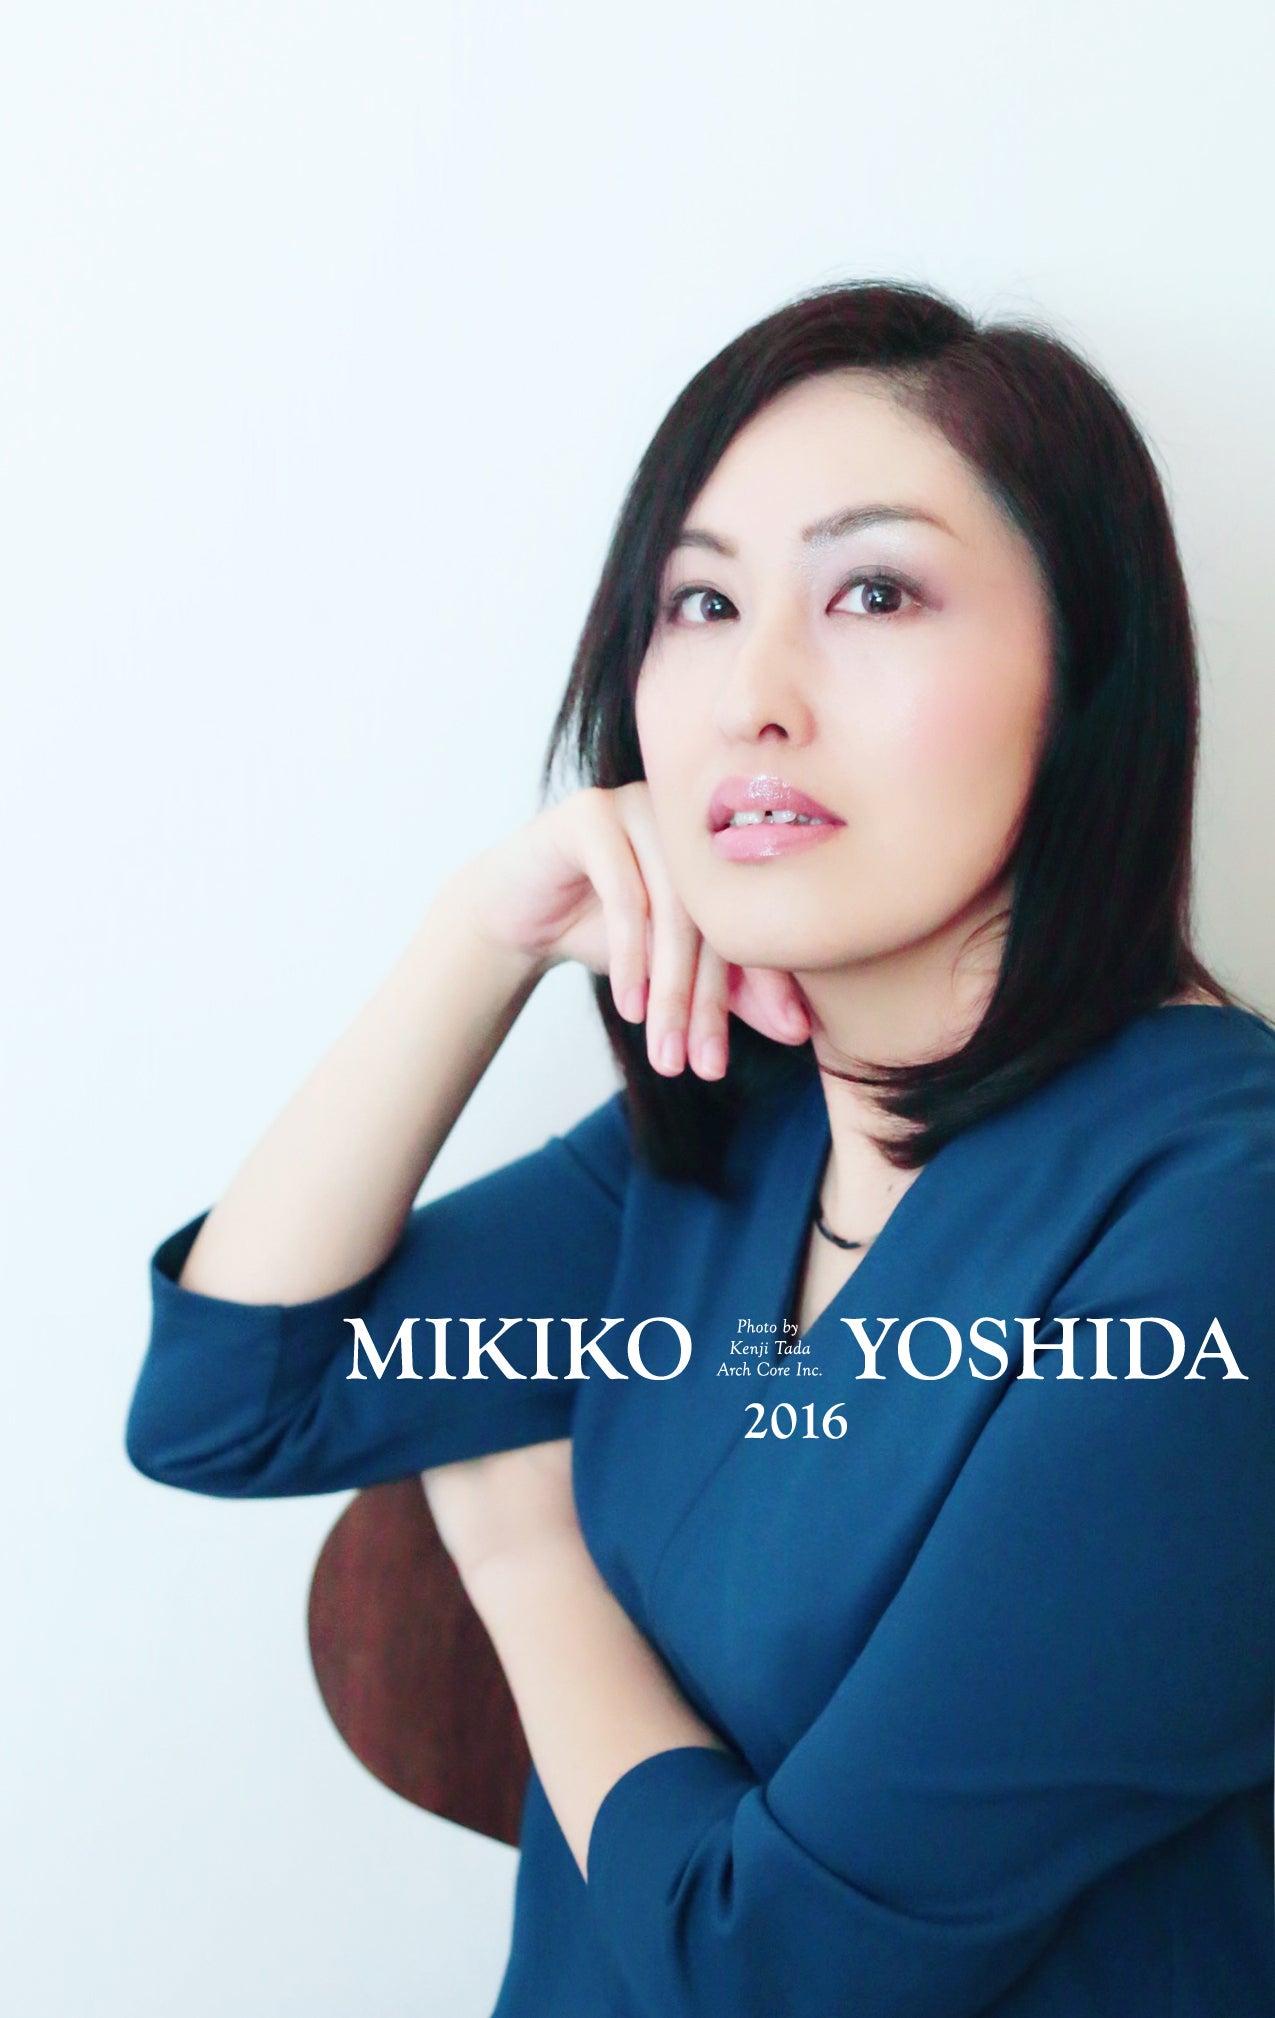 Mikkoさまポートレート・プロフィール撮影